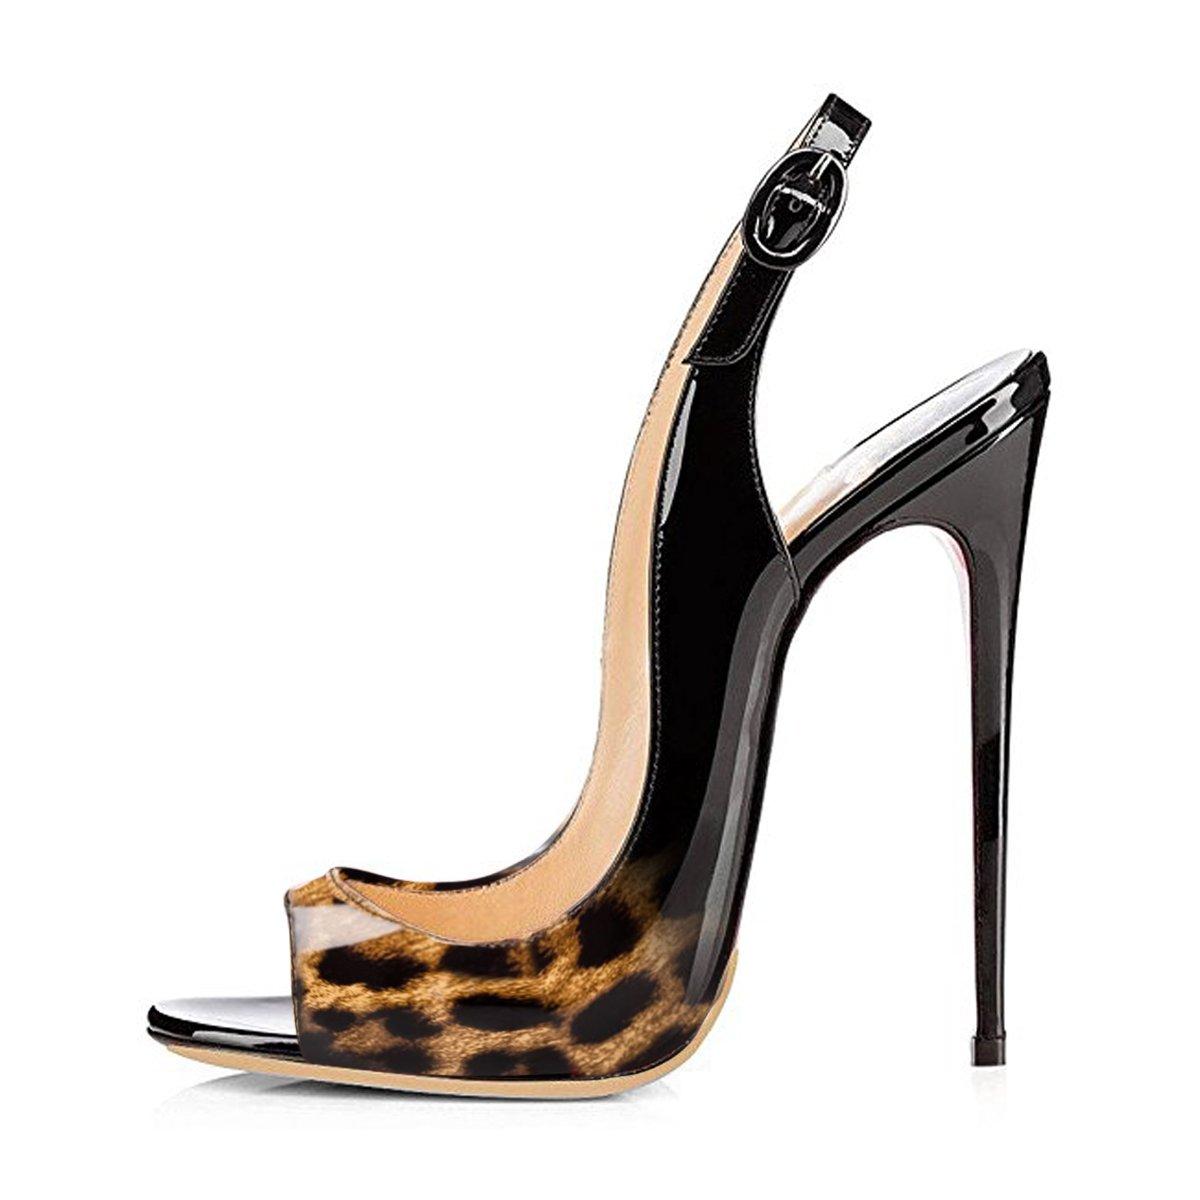 2bd2324460 Amazon.com | Onlymaker Women's Peep Toe Heeled Sandals Slingback High Heel  Stiletto Pumps for Party Dress Working | Heeled Sandals